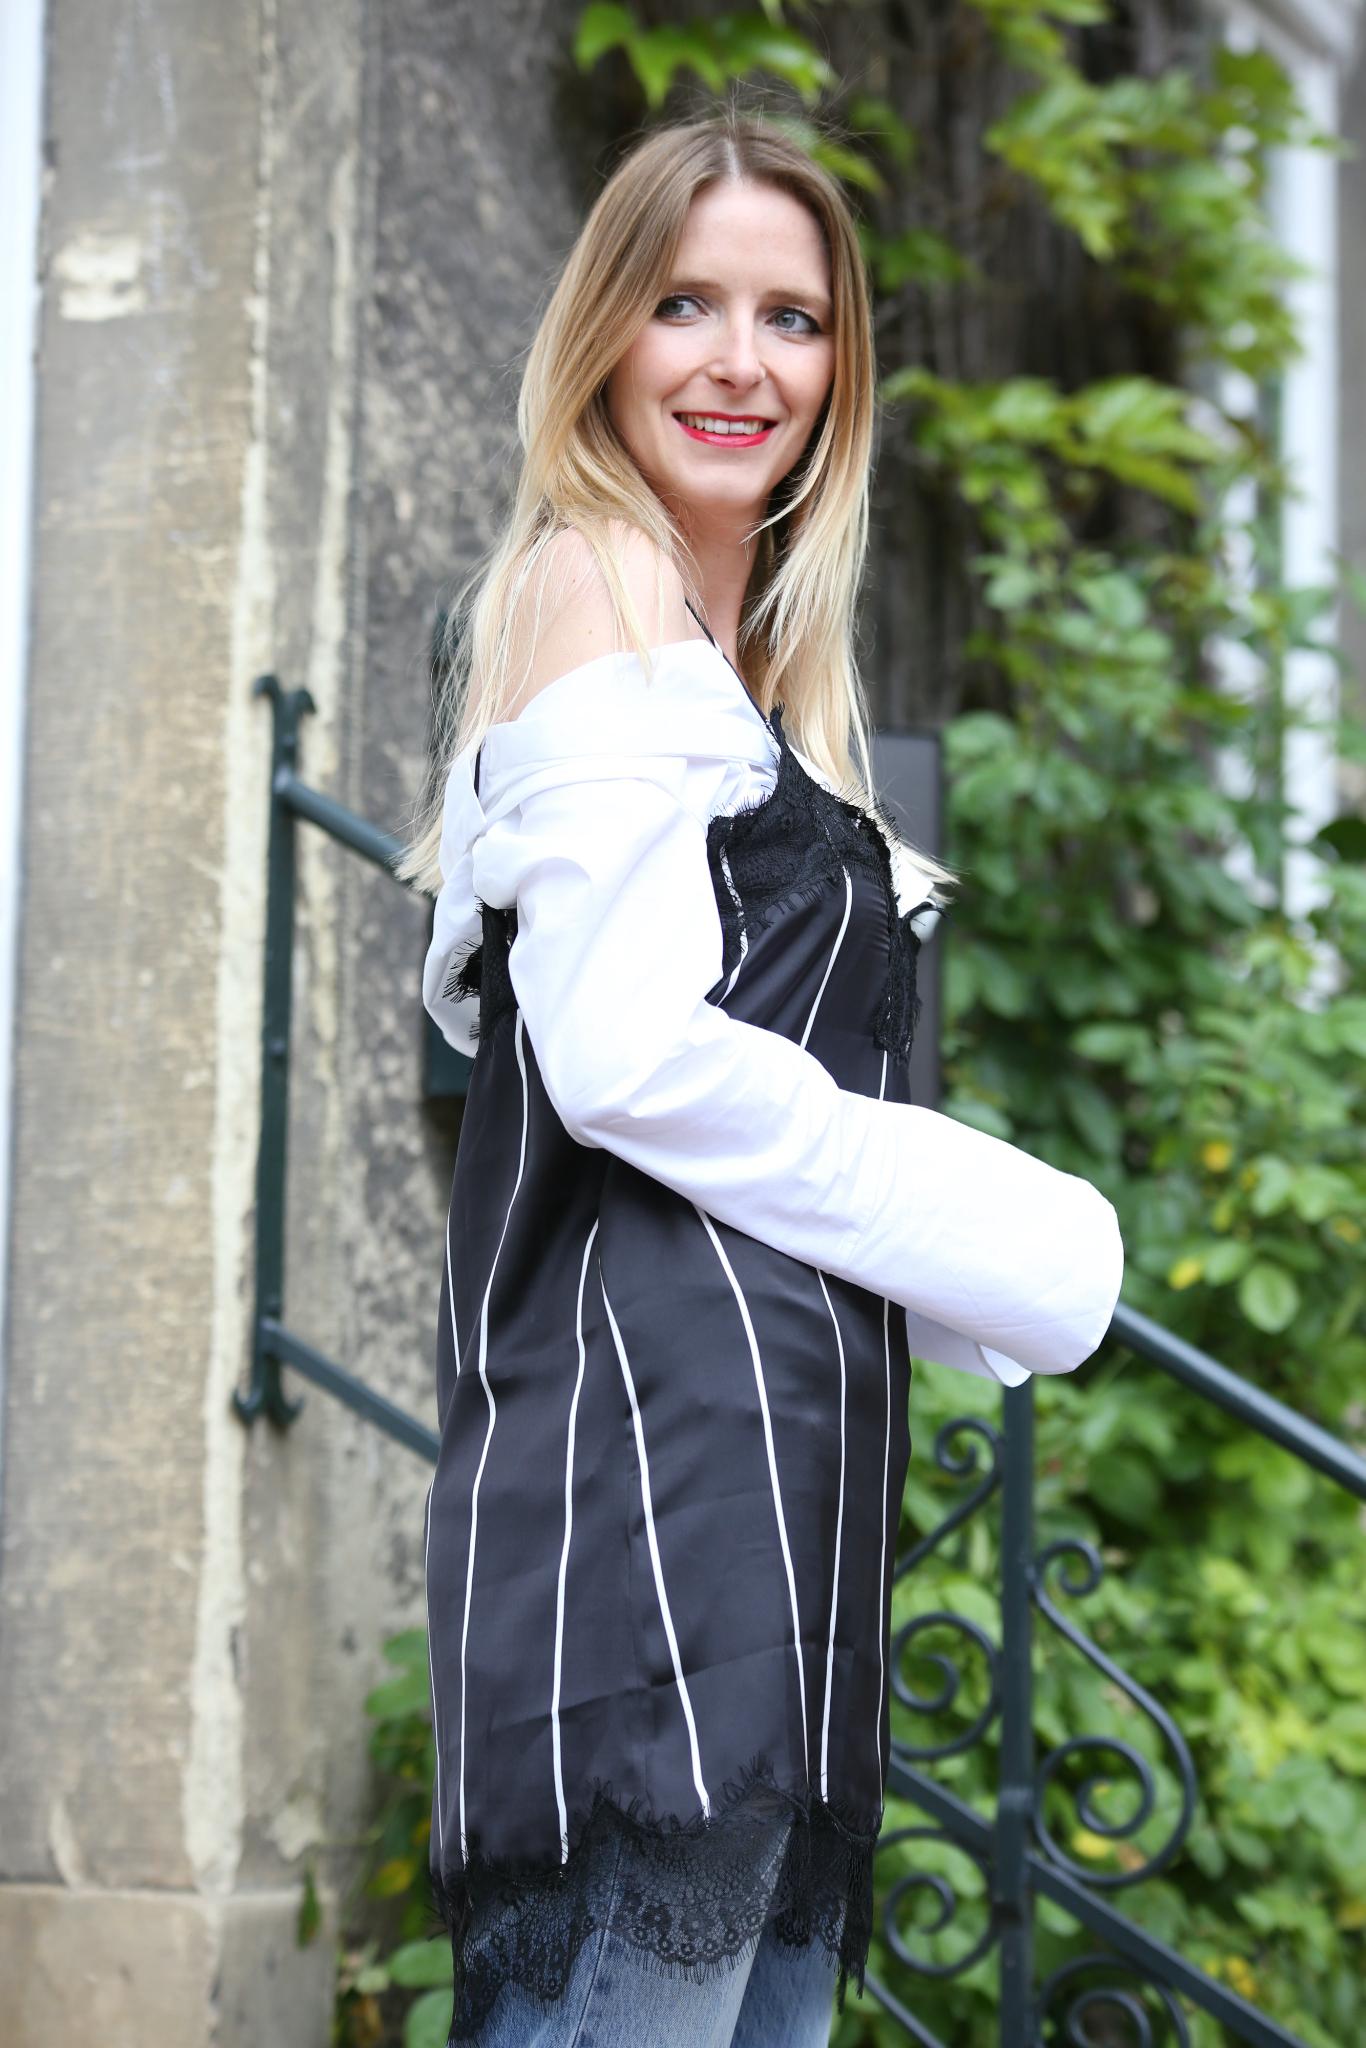 Fashion_Outfit_Off_Shoulder_Slipdress_MOD - by Monique_About me